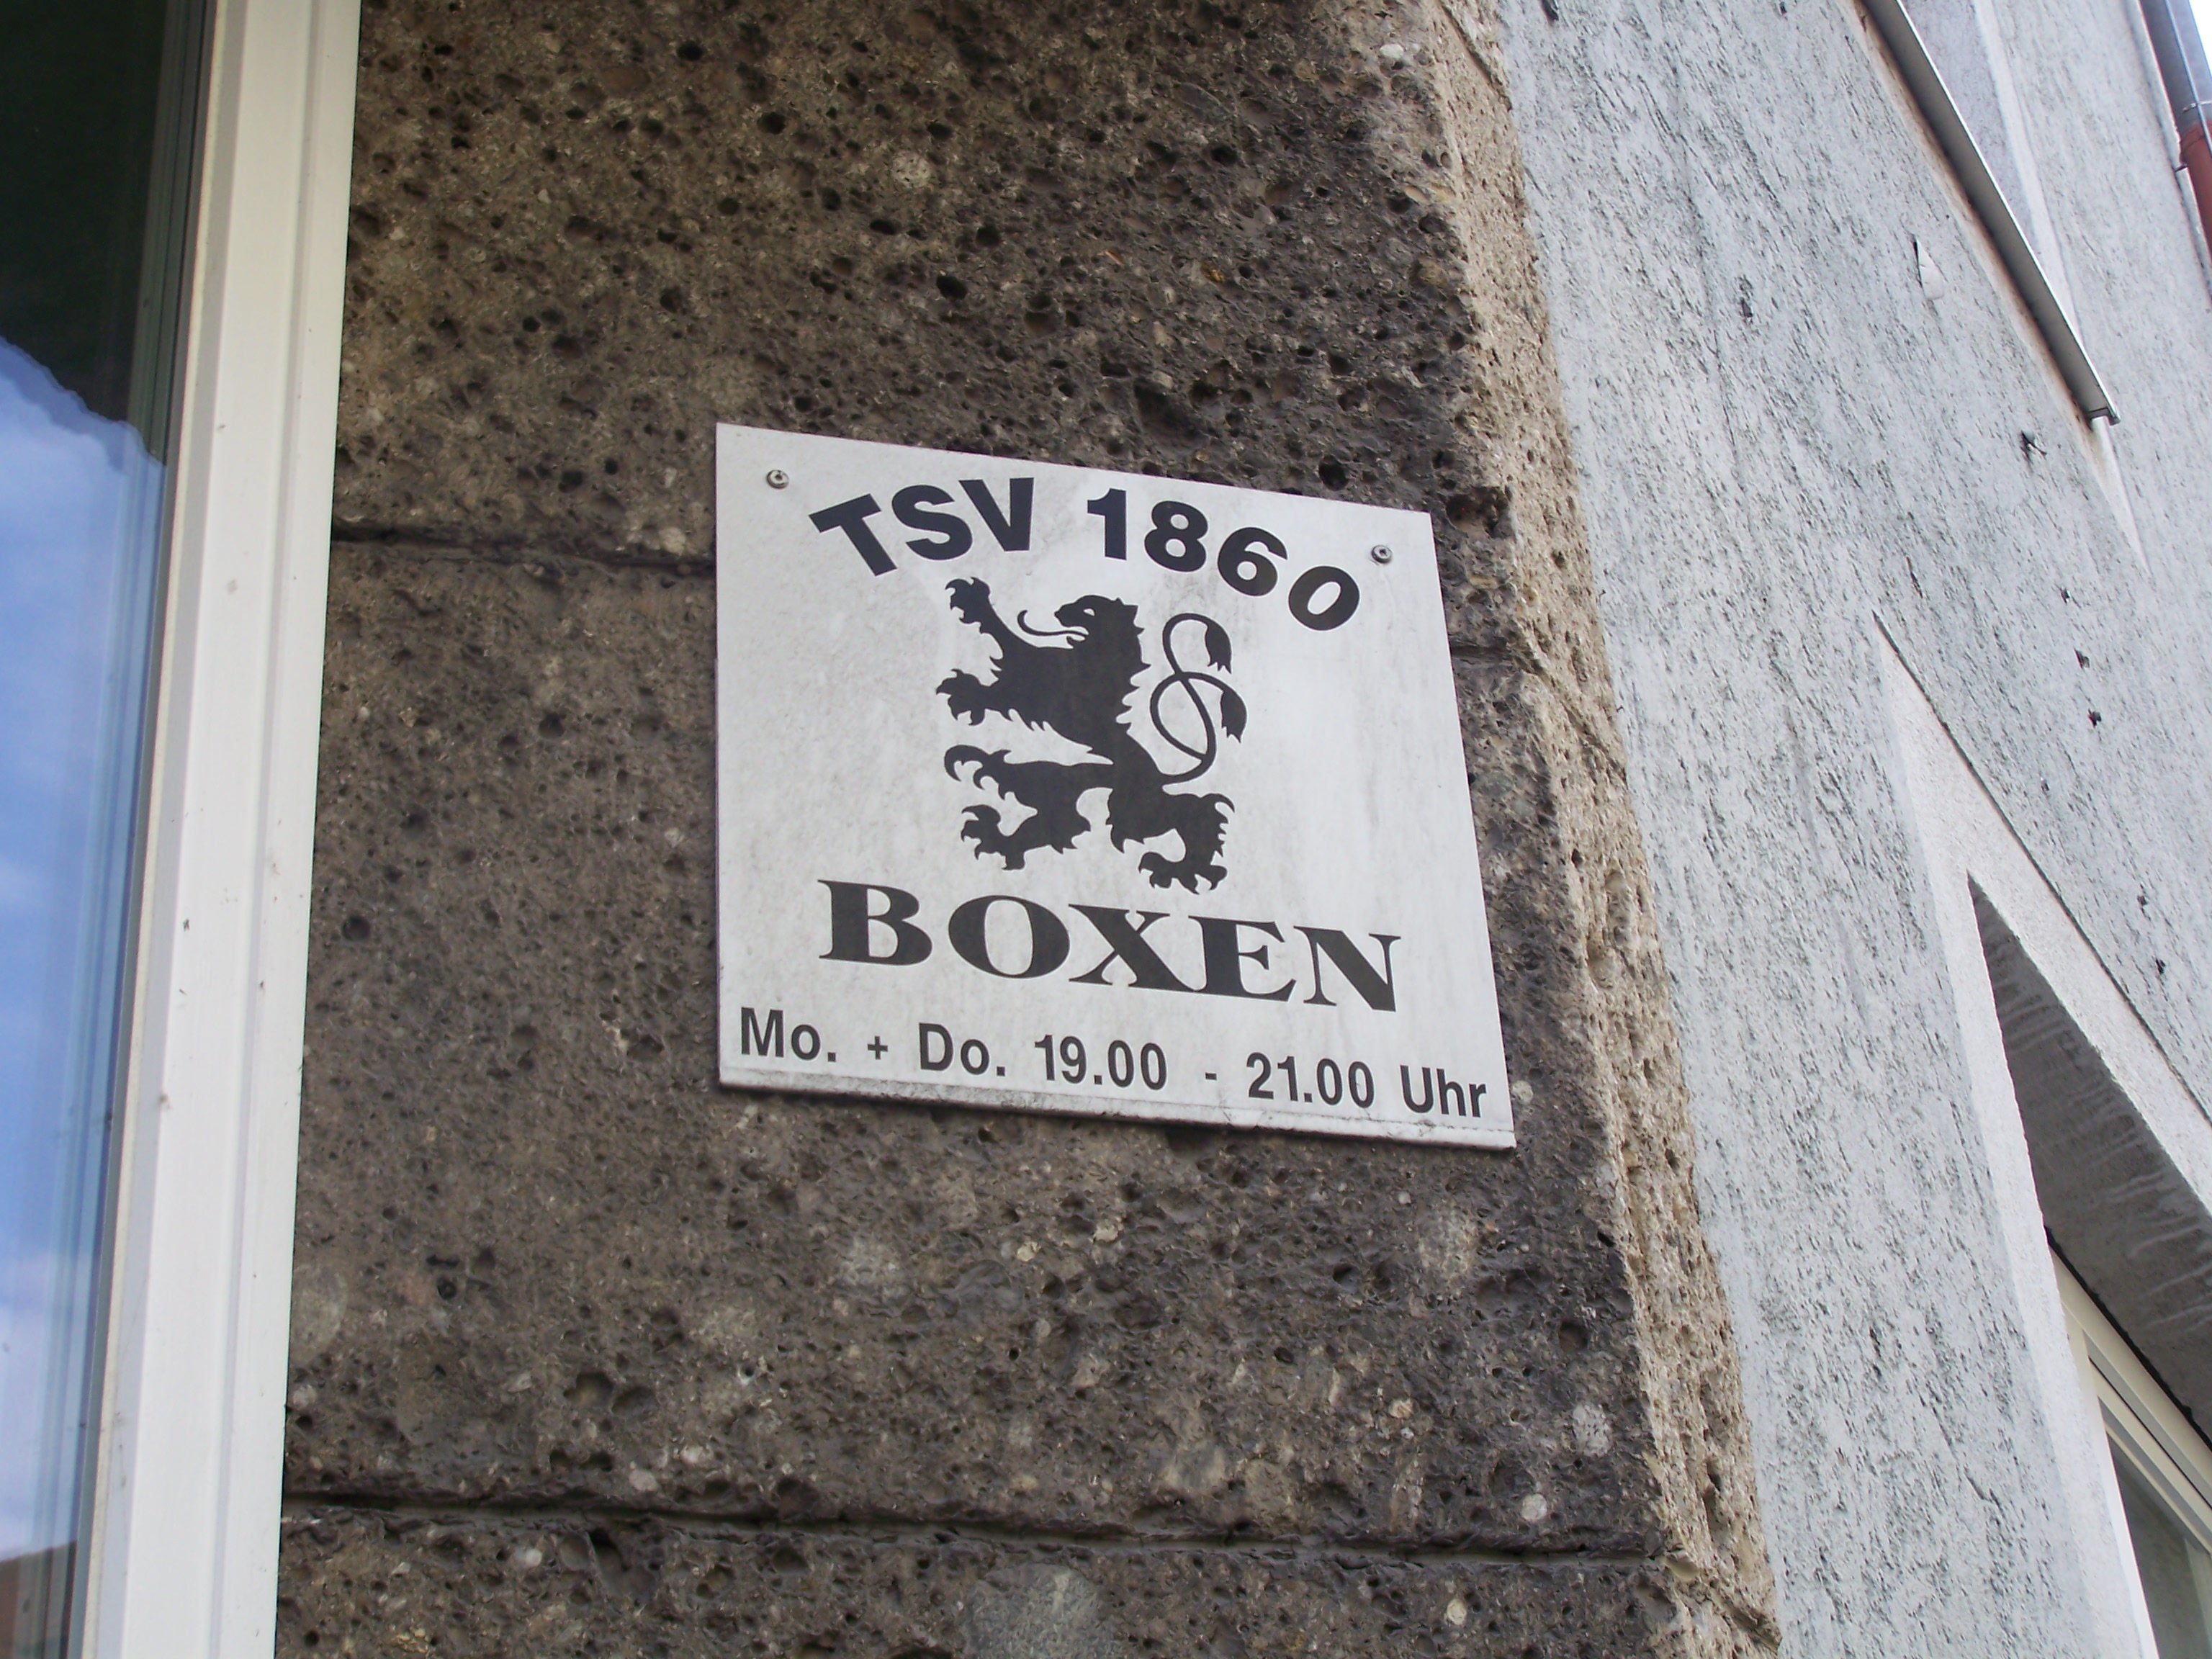 1860 MГјnchen Boxen